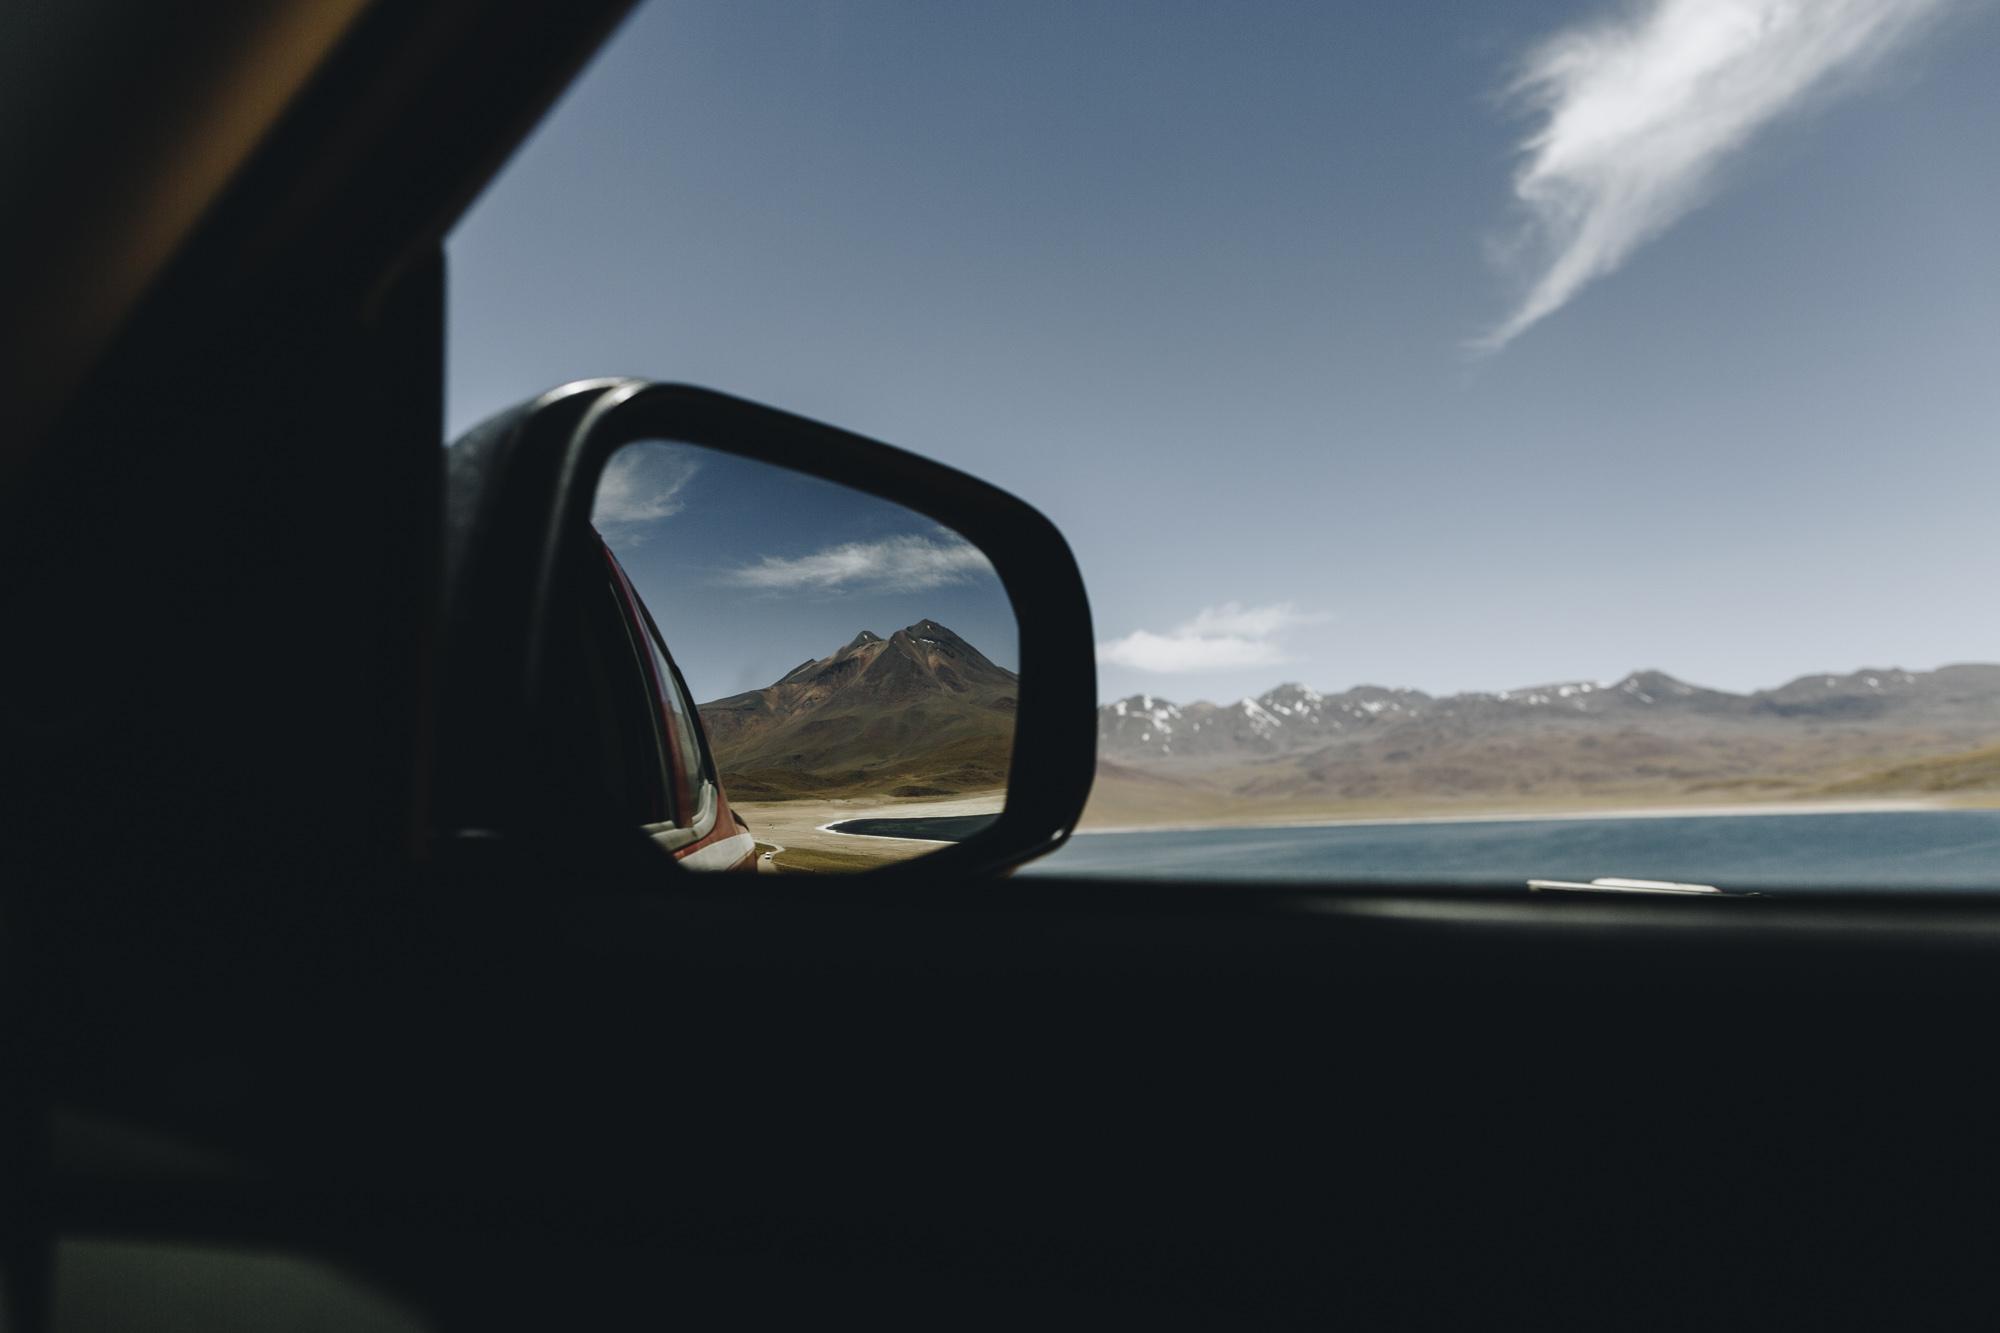 Mael Lambla photographer Chile San pedro atacama desert-251.jpg